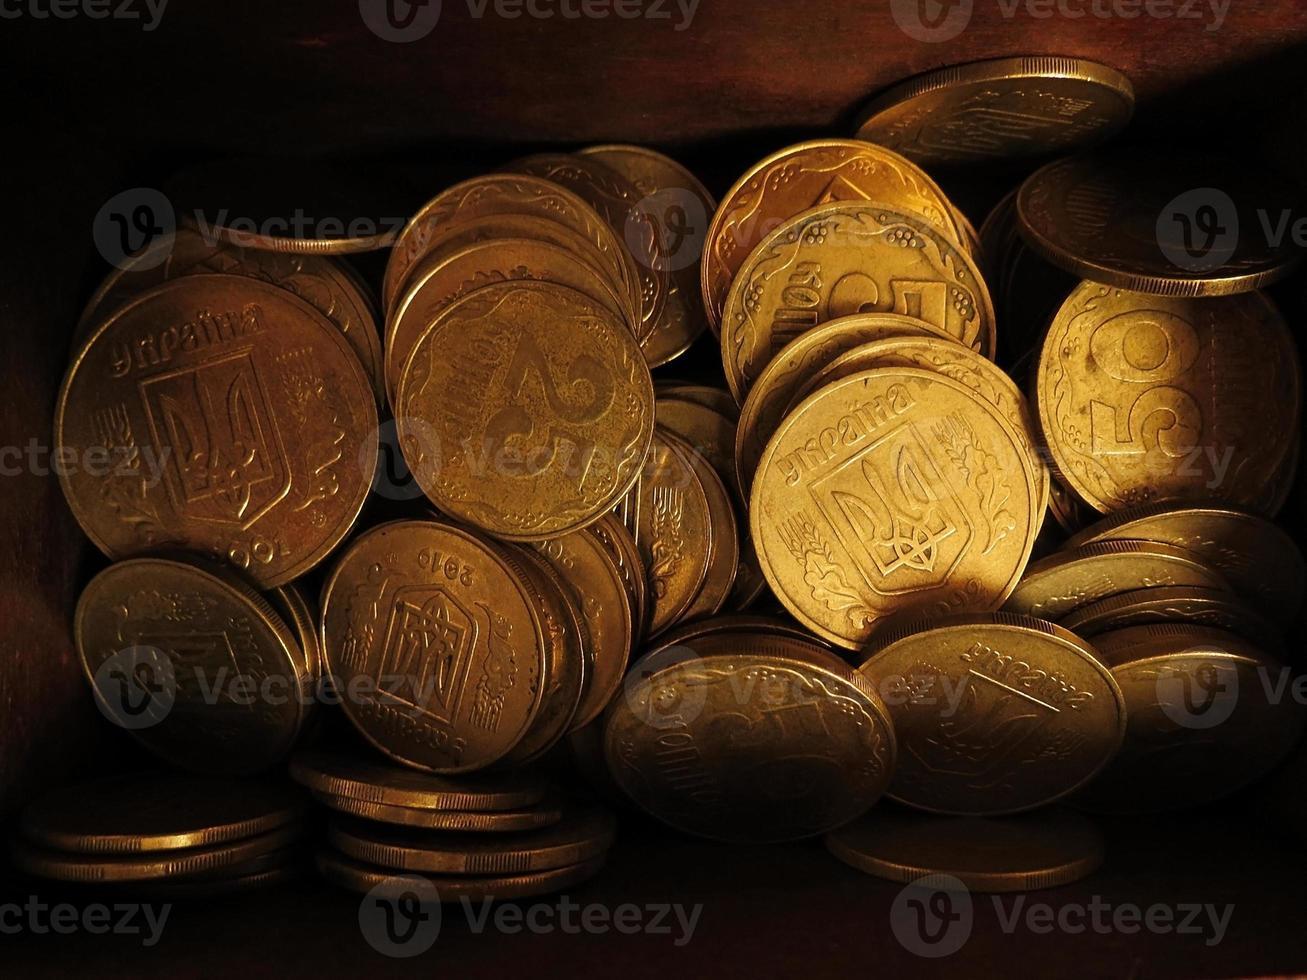 Oekraïens geld (hryvnia) in de borst foto